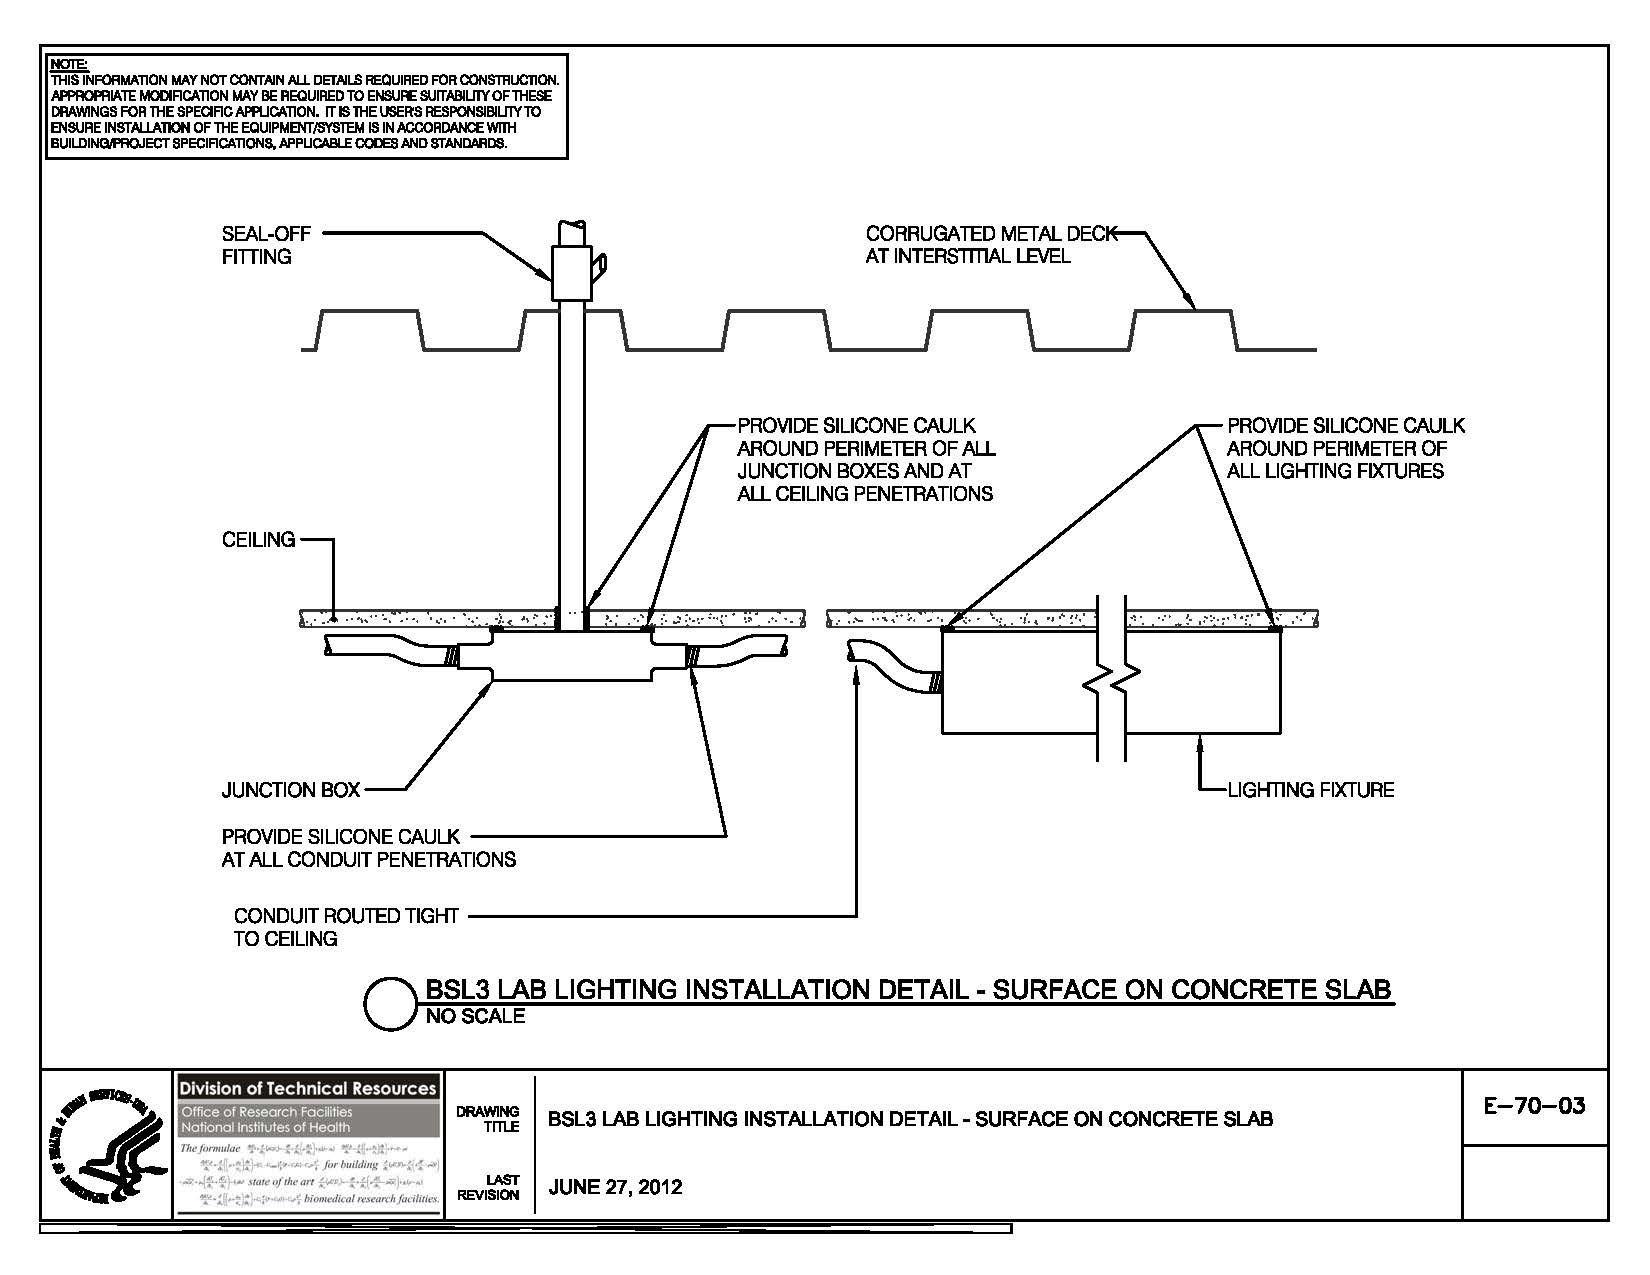 4 Wire Rtd Wiring Diagram Rtd Wiring Diagram New Popular 4 Wire Rtd Wiring Diagram Uptuto Of 4 Wire Rtd Wiring Diagram